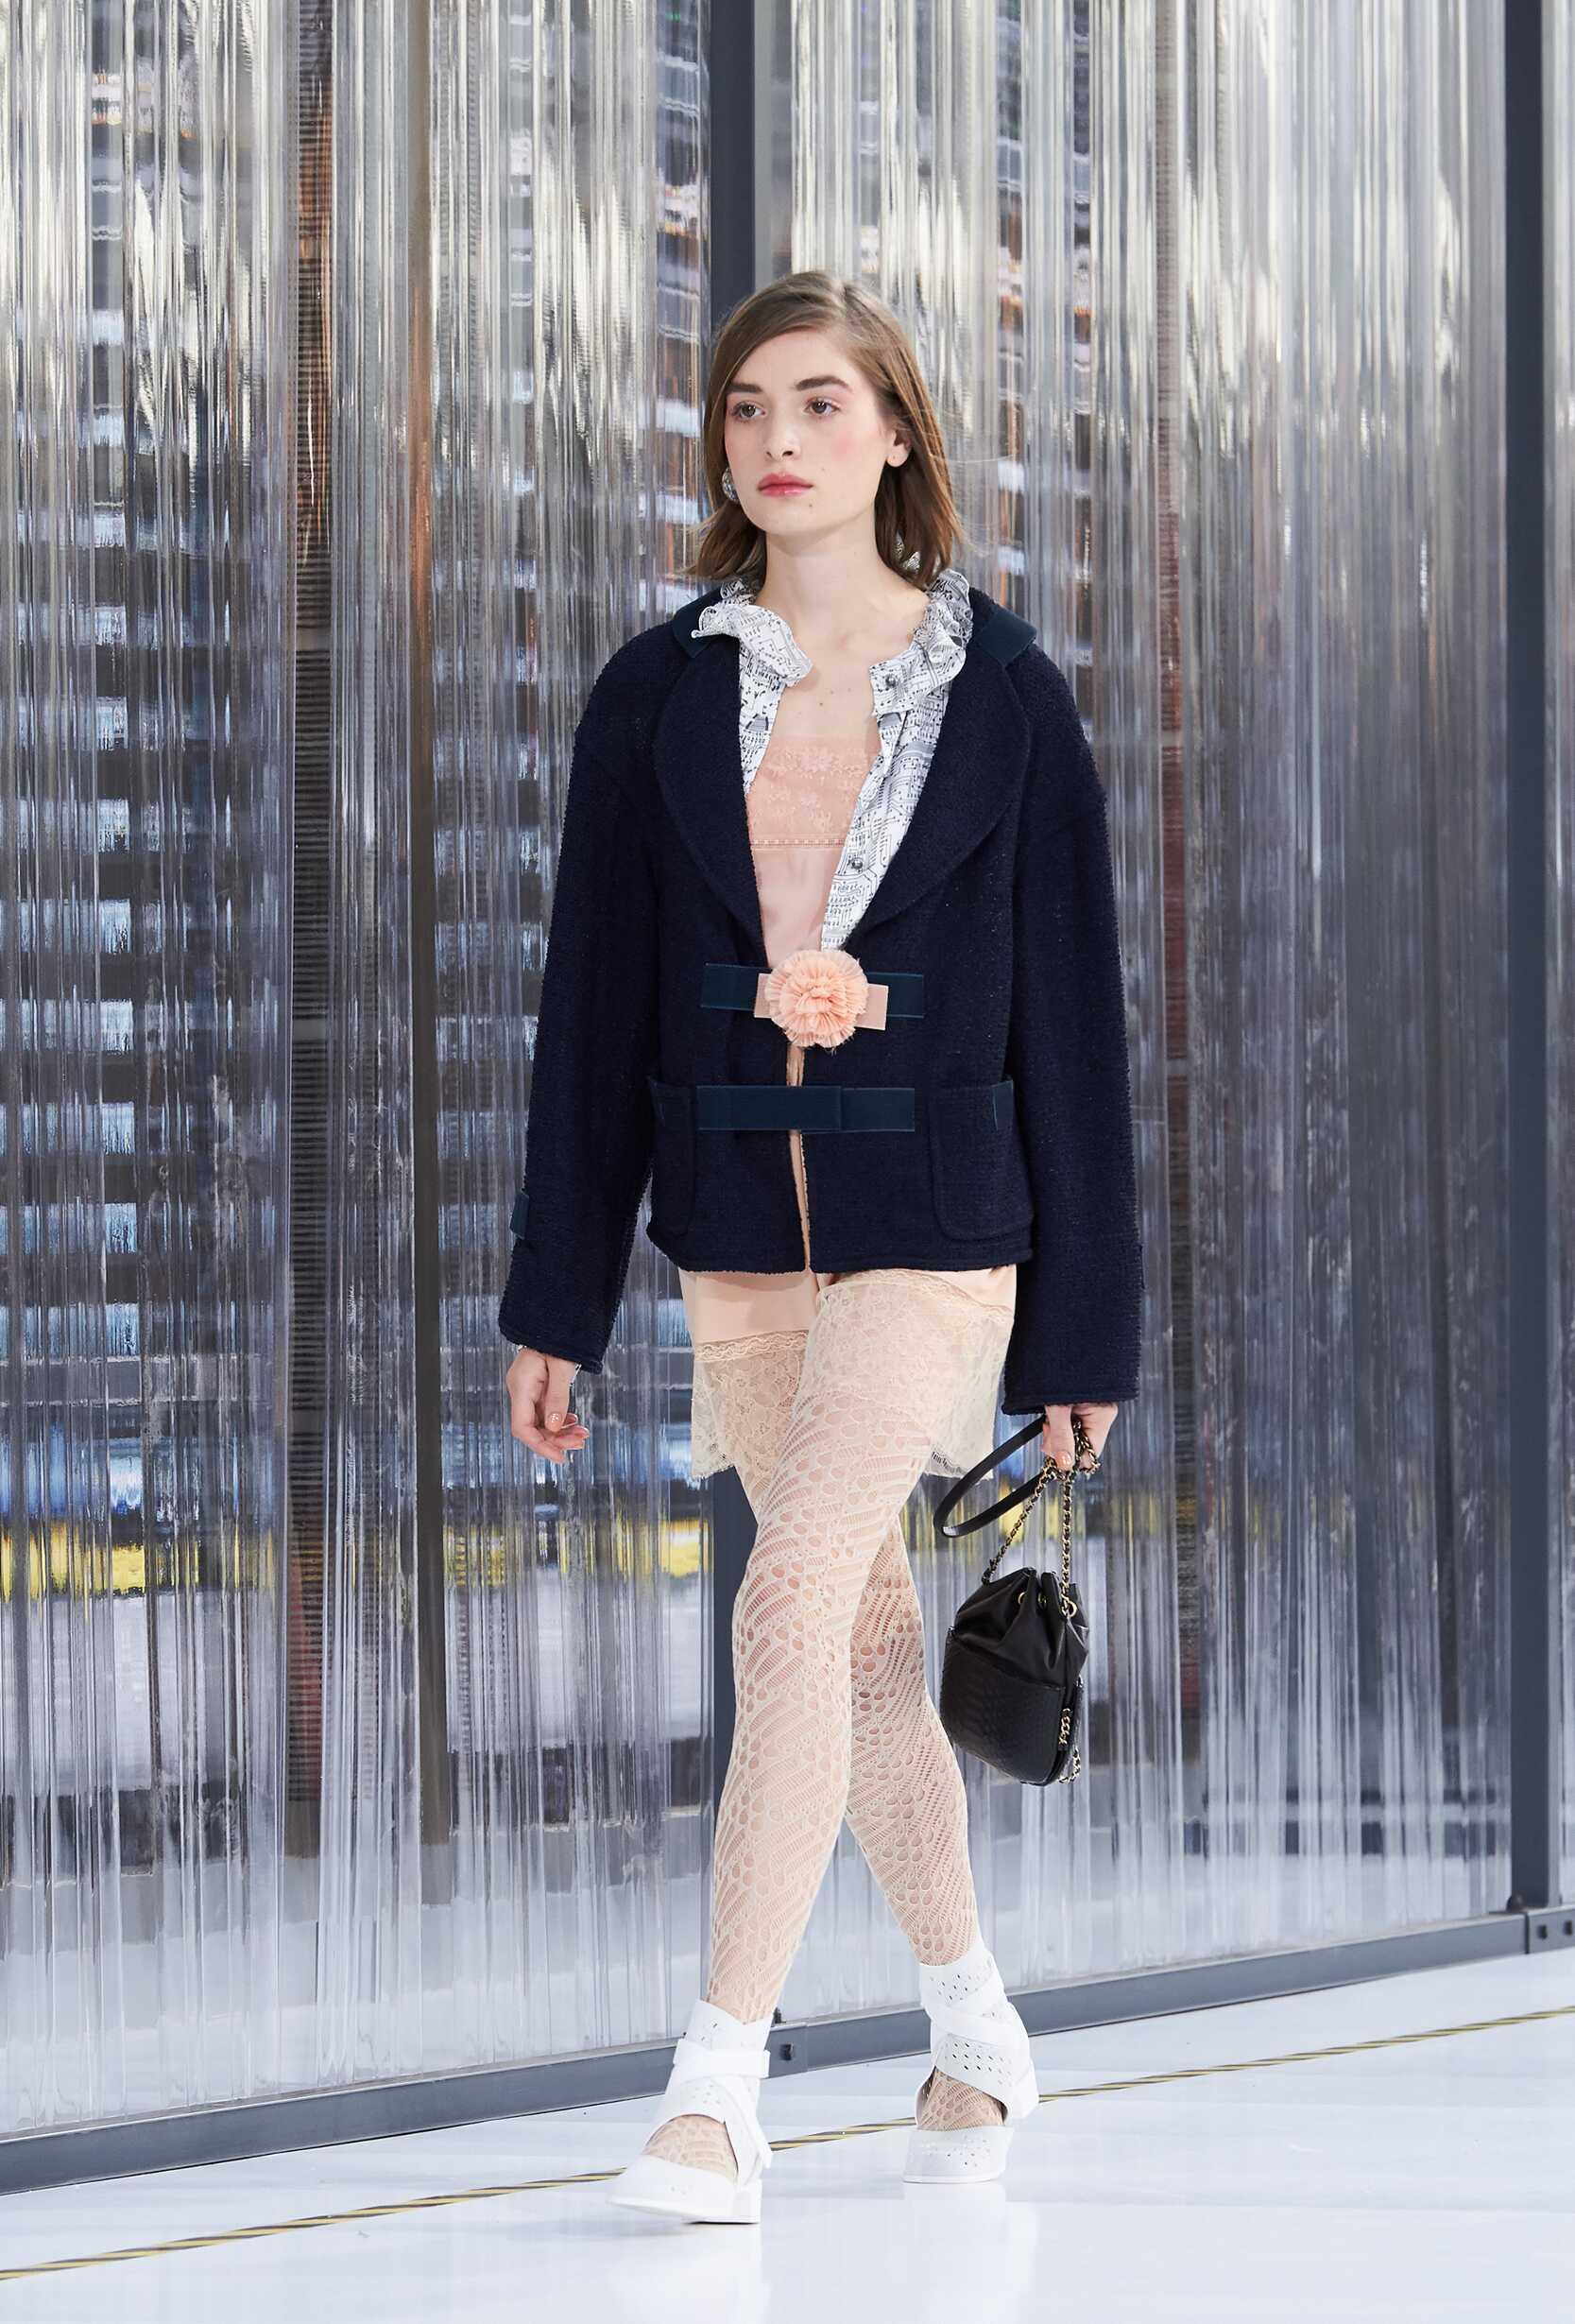 SS 2017 Chanel Show Paris Fashion Week